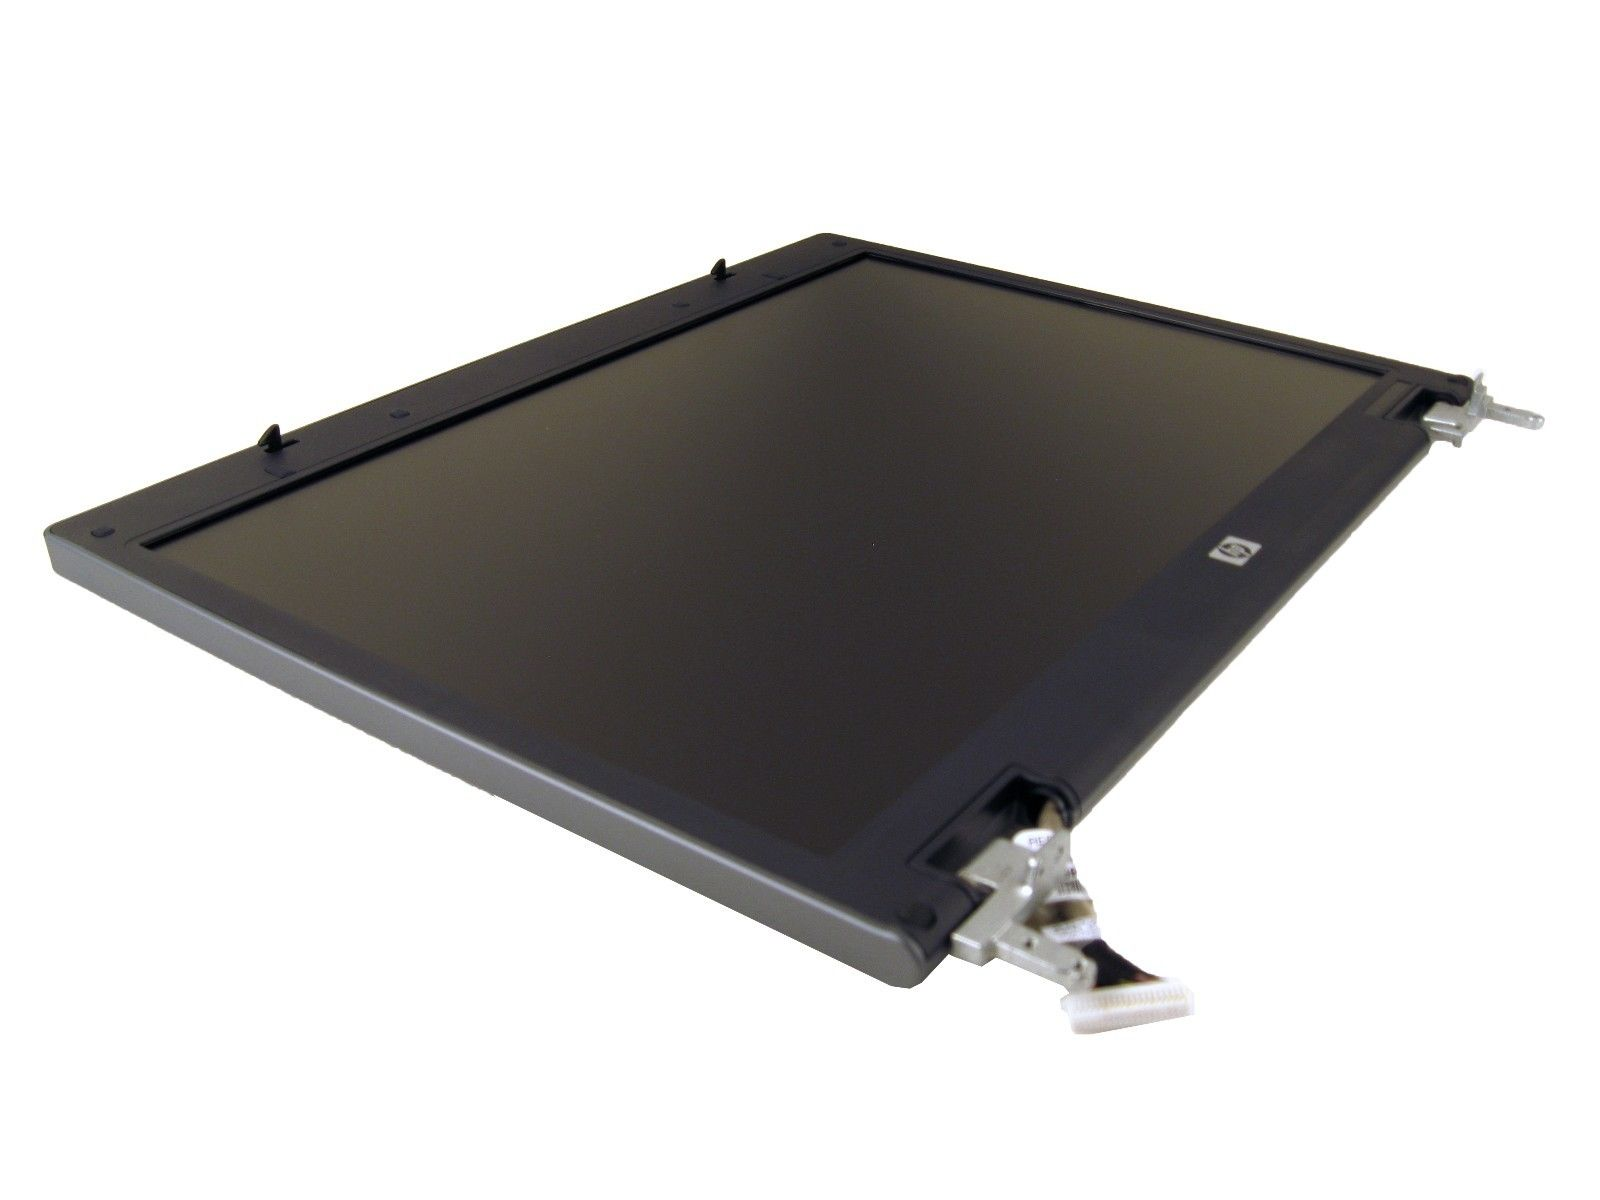 HP COMPAQ 446900-001 LAPTOP SCREEN HP Business PC 6710b, 6715b